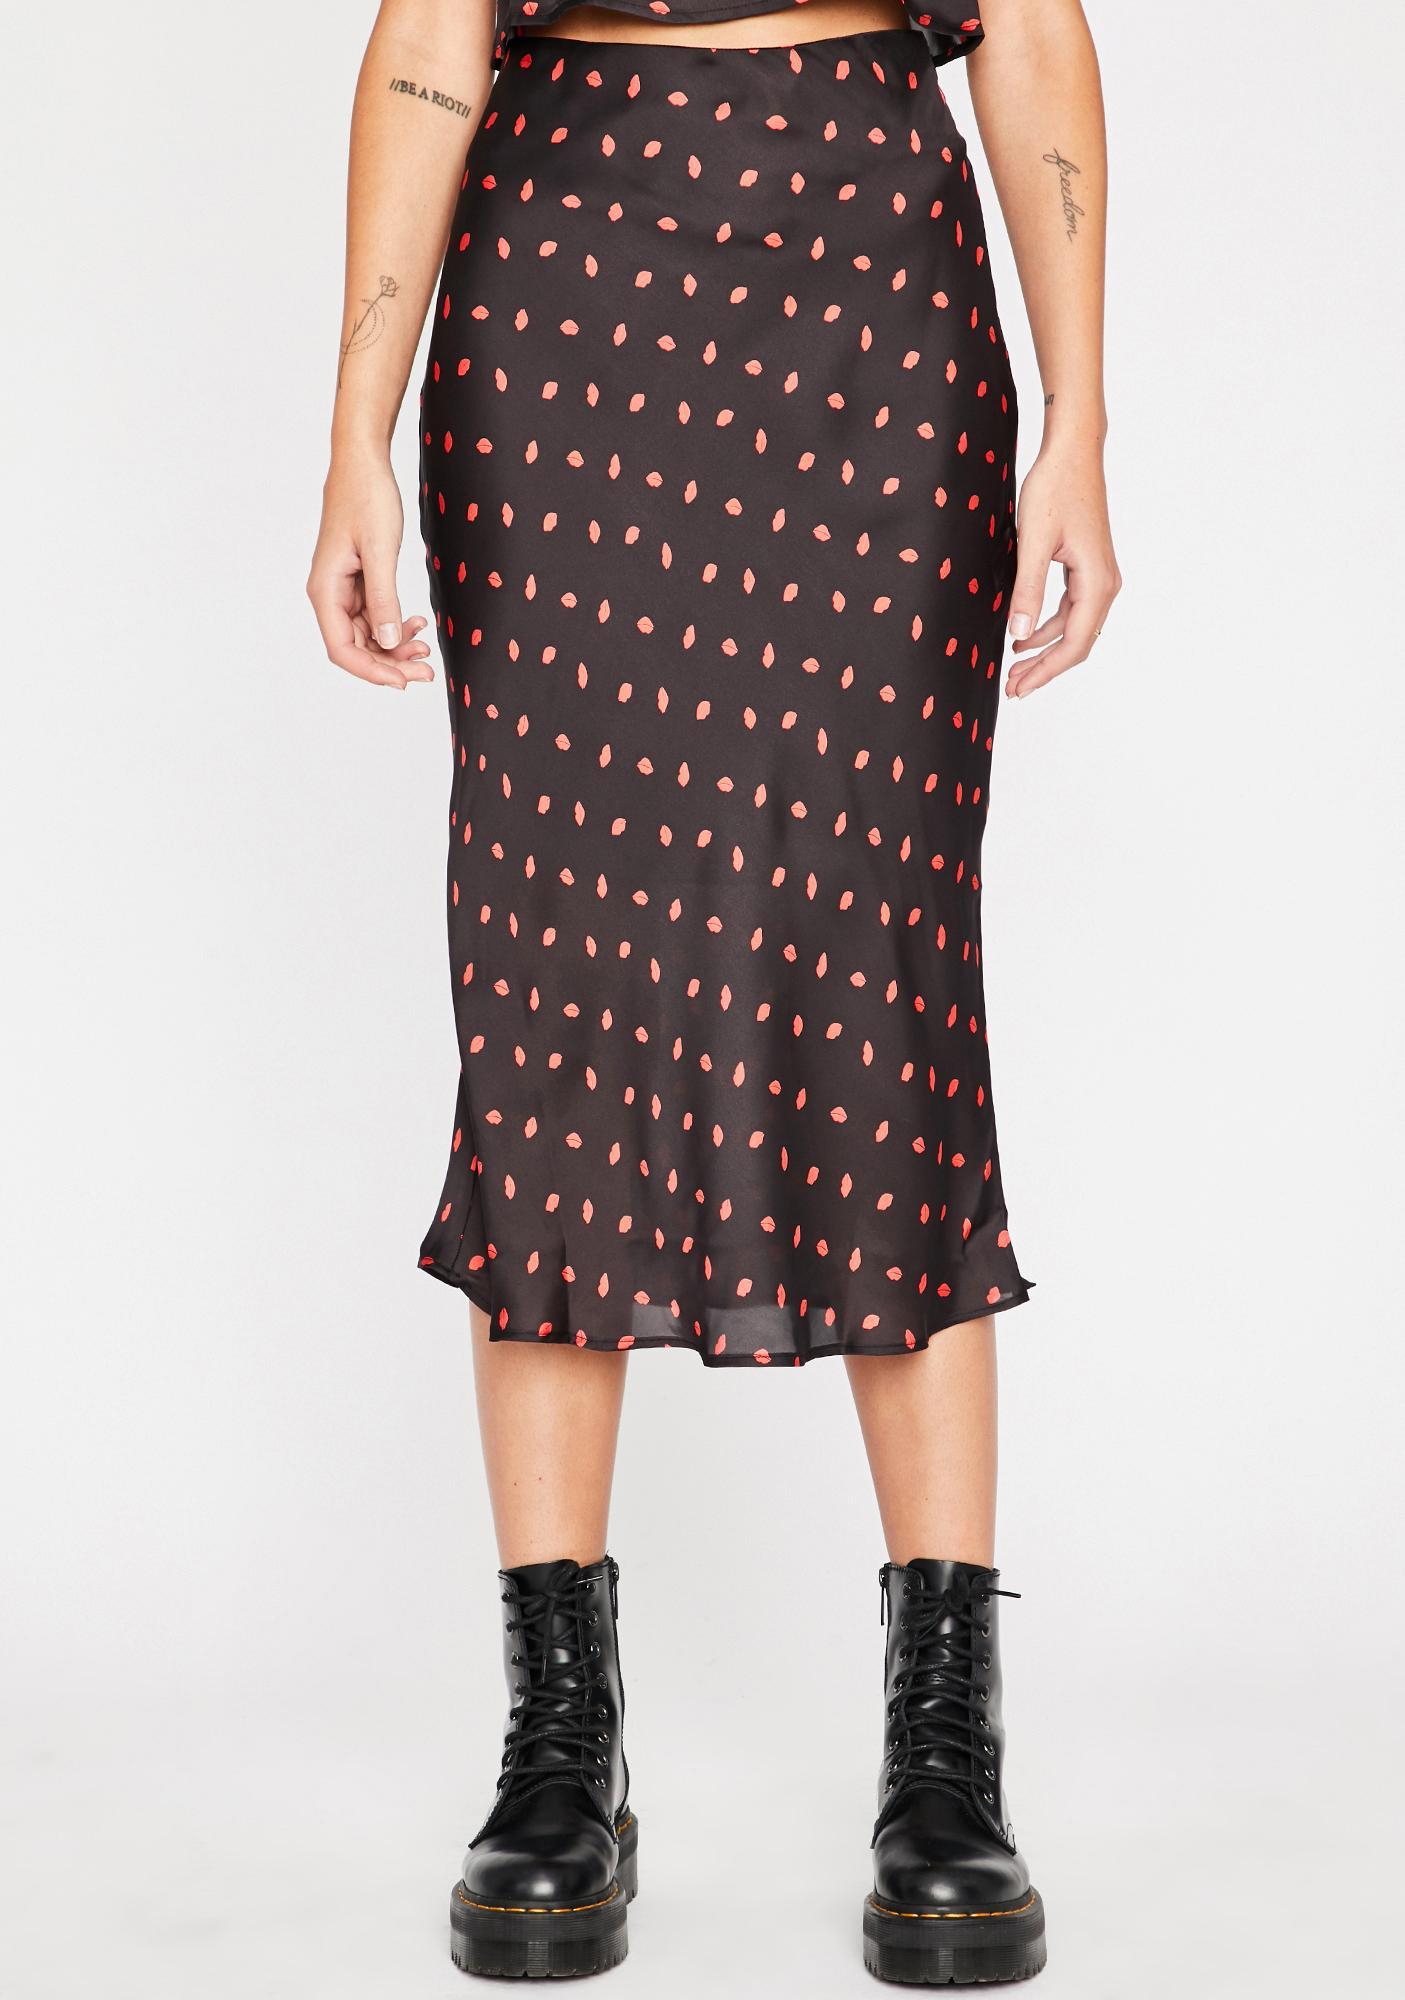 Kiss Of Death Midi Skirt